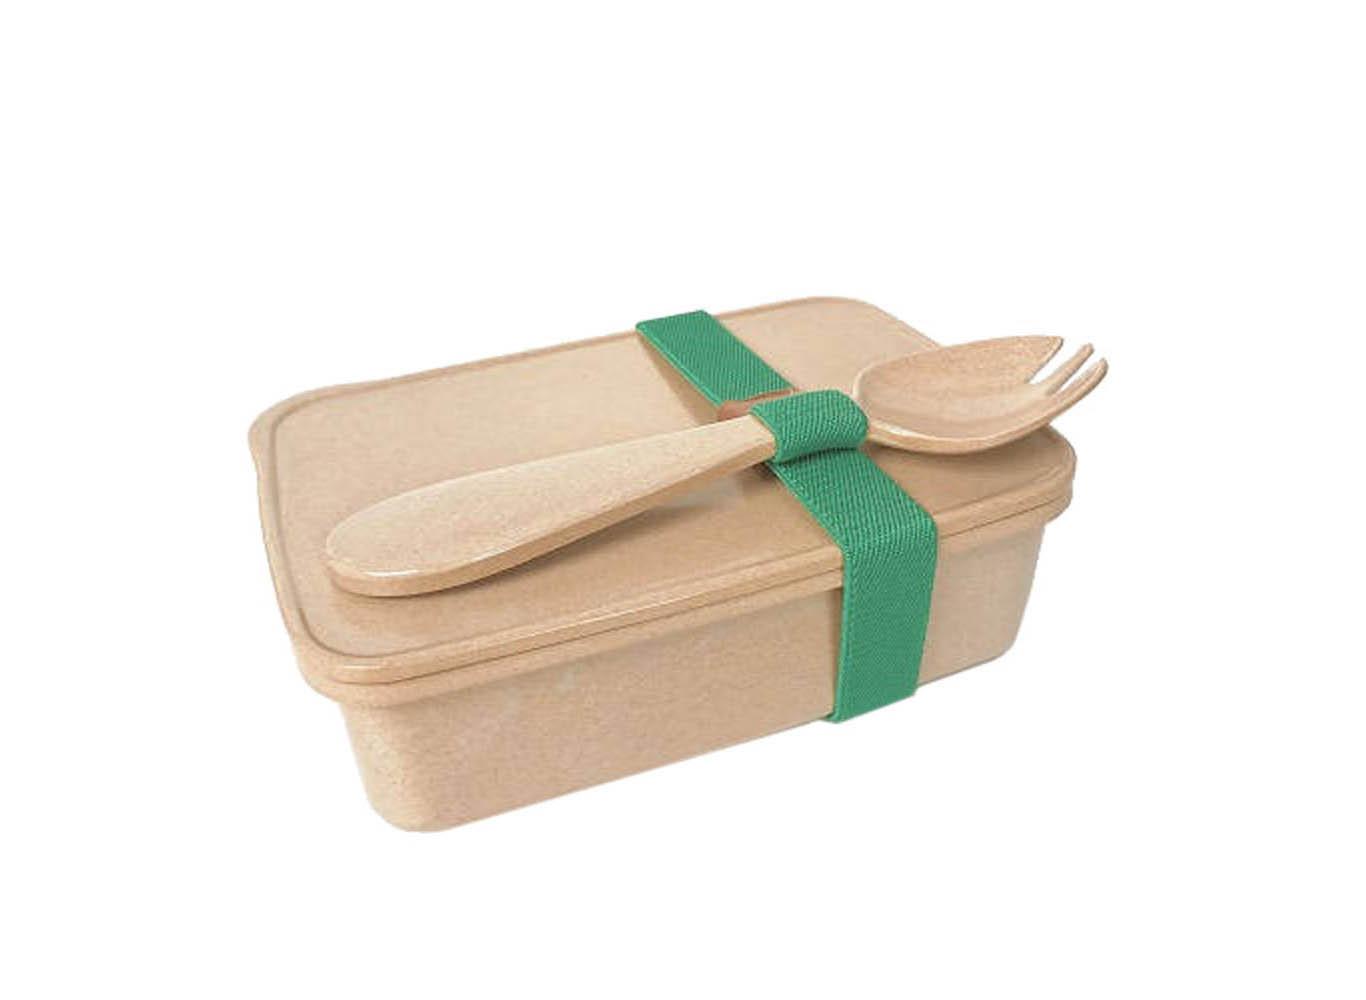 100% Biodegradable Rice Husk Fiber Bento Box